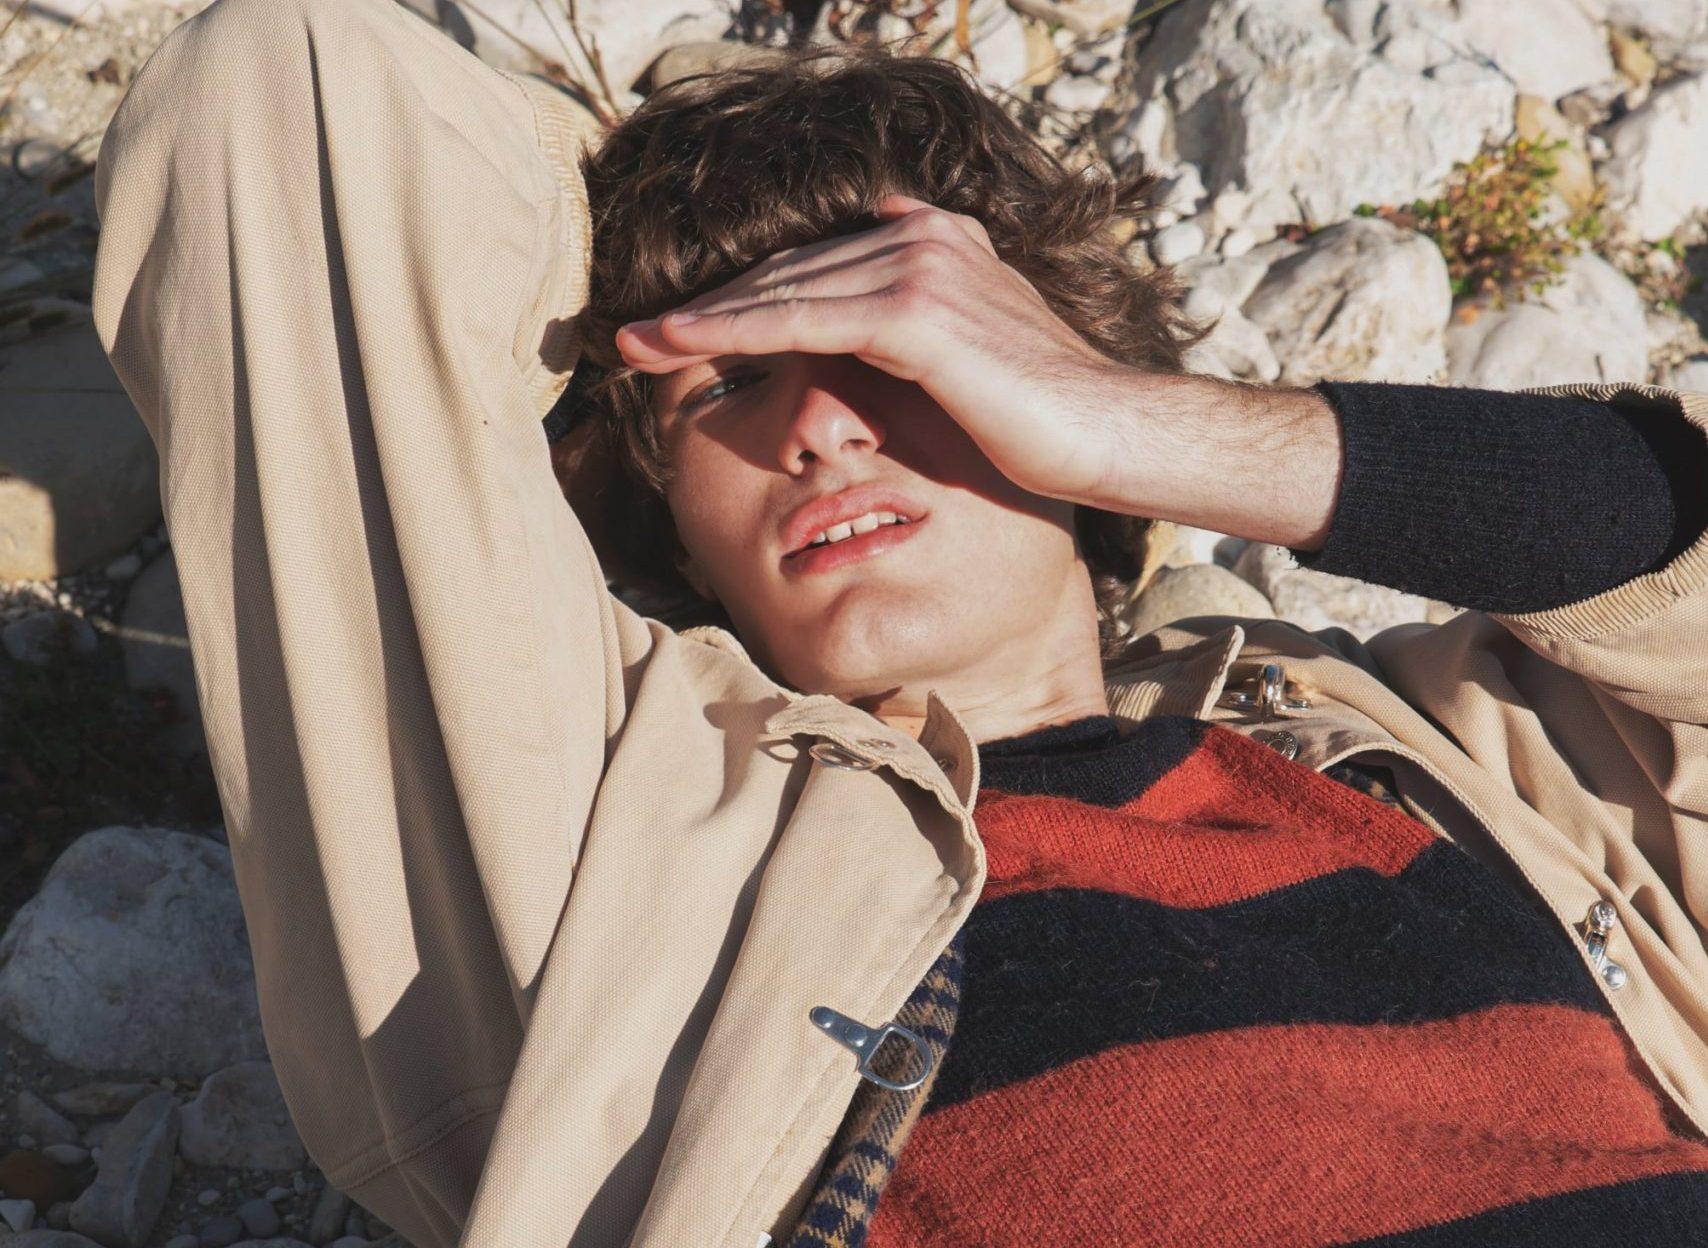 Escape for a Day by Mattia De Benedictis Escape for a Day by Mattia De Benedictis Vanity Teen Menswear & new faces magazine